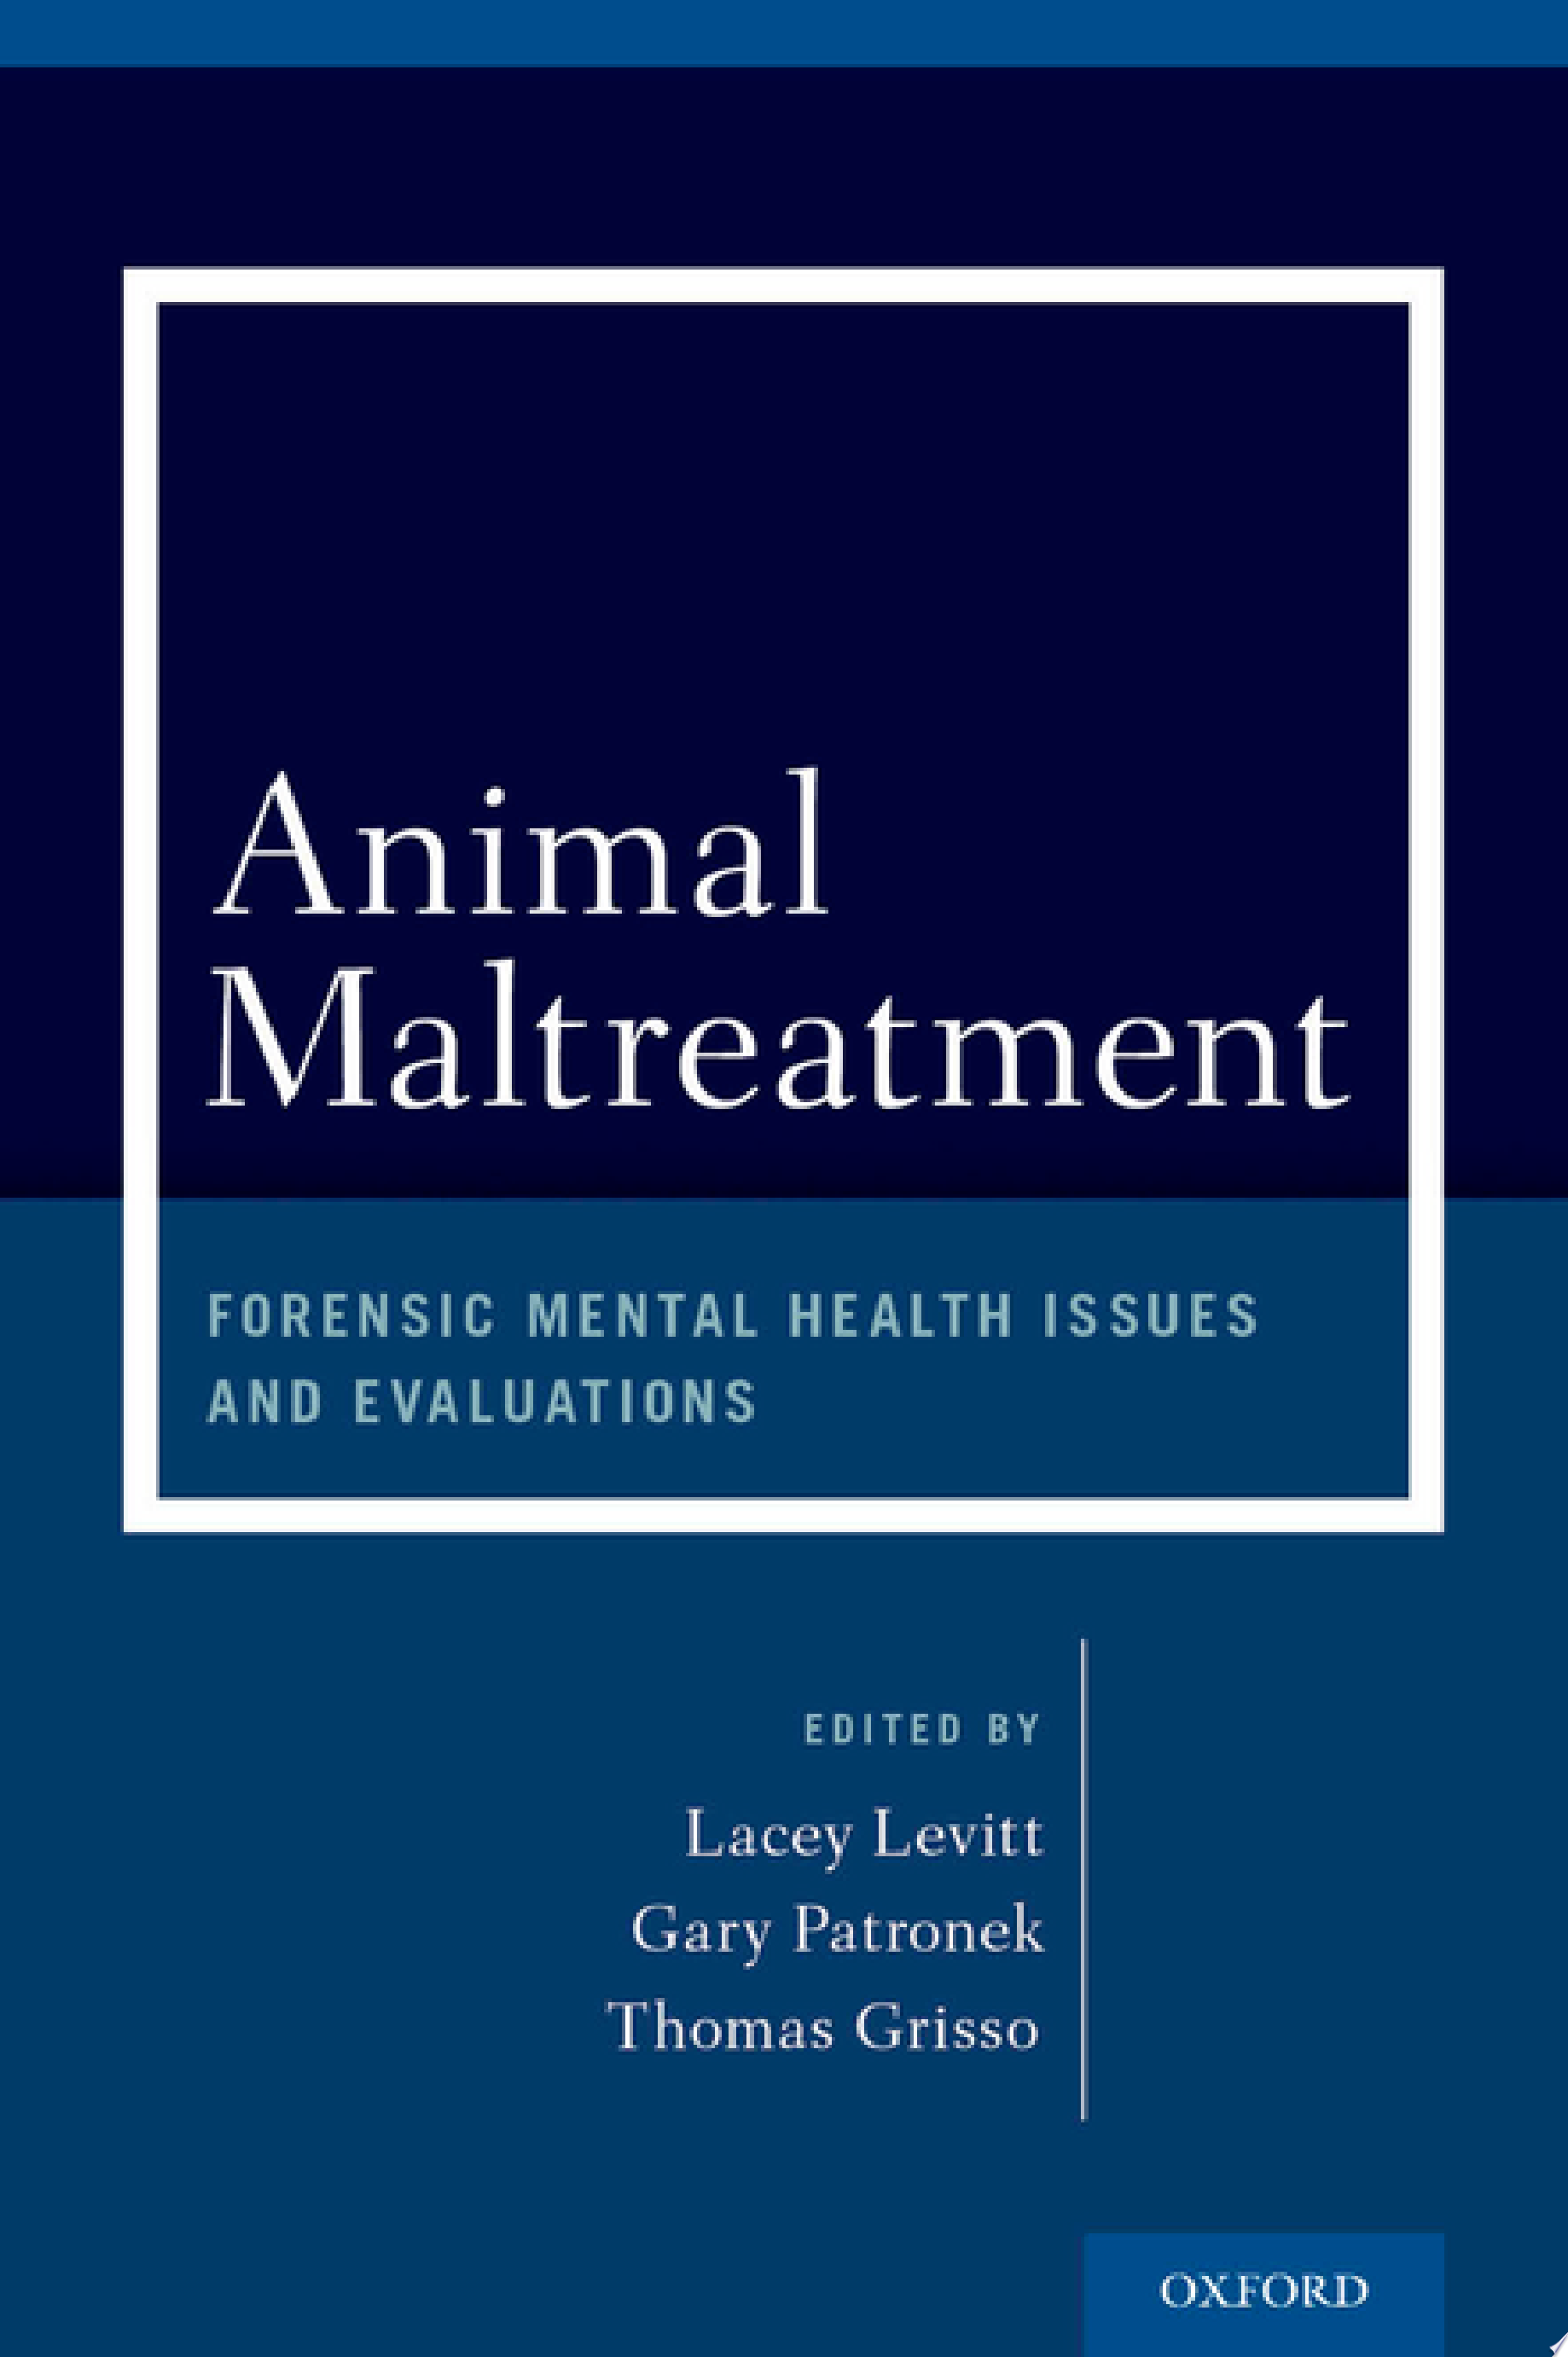 Animal Maltreatment